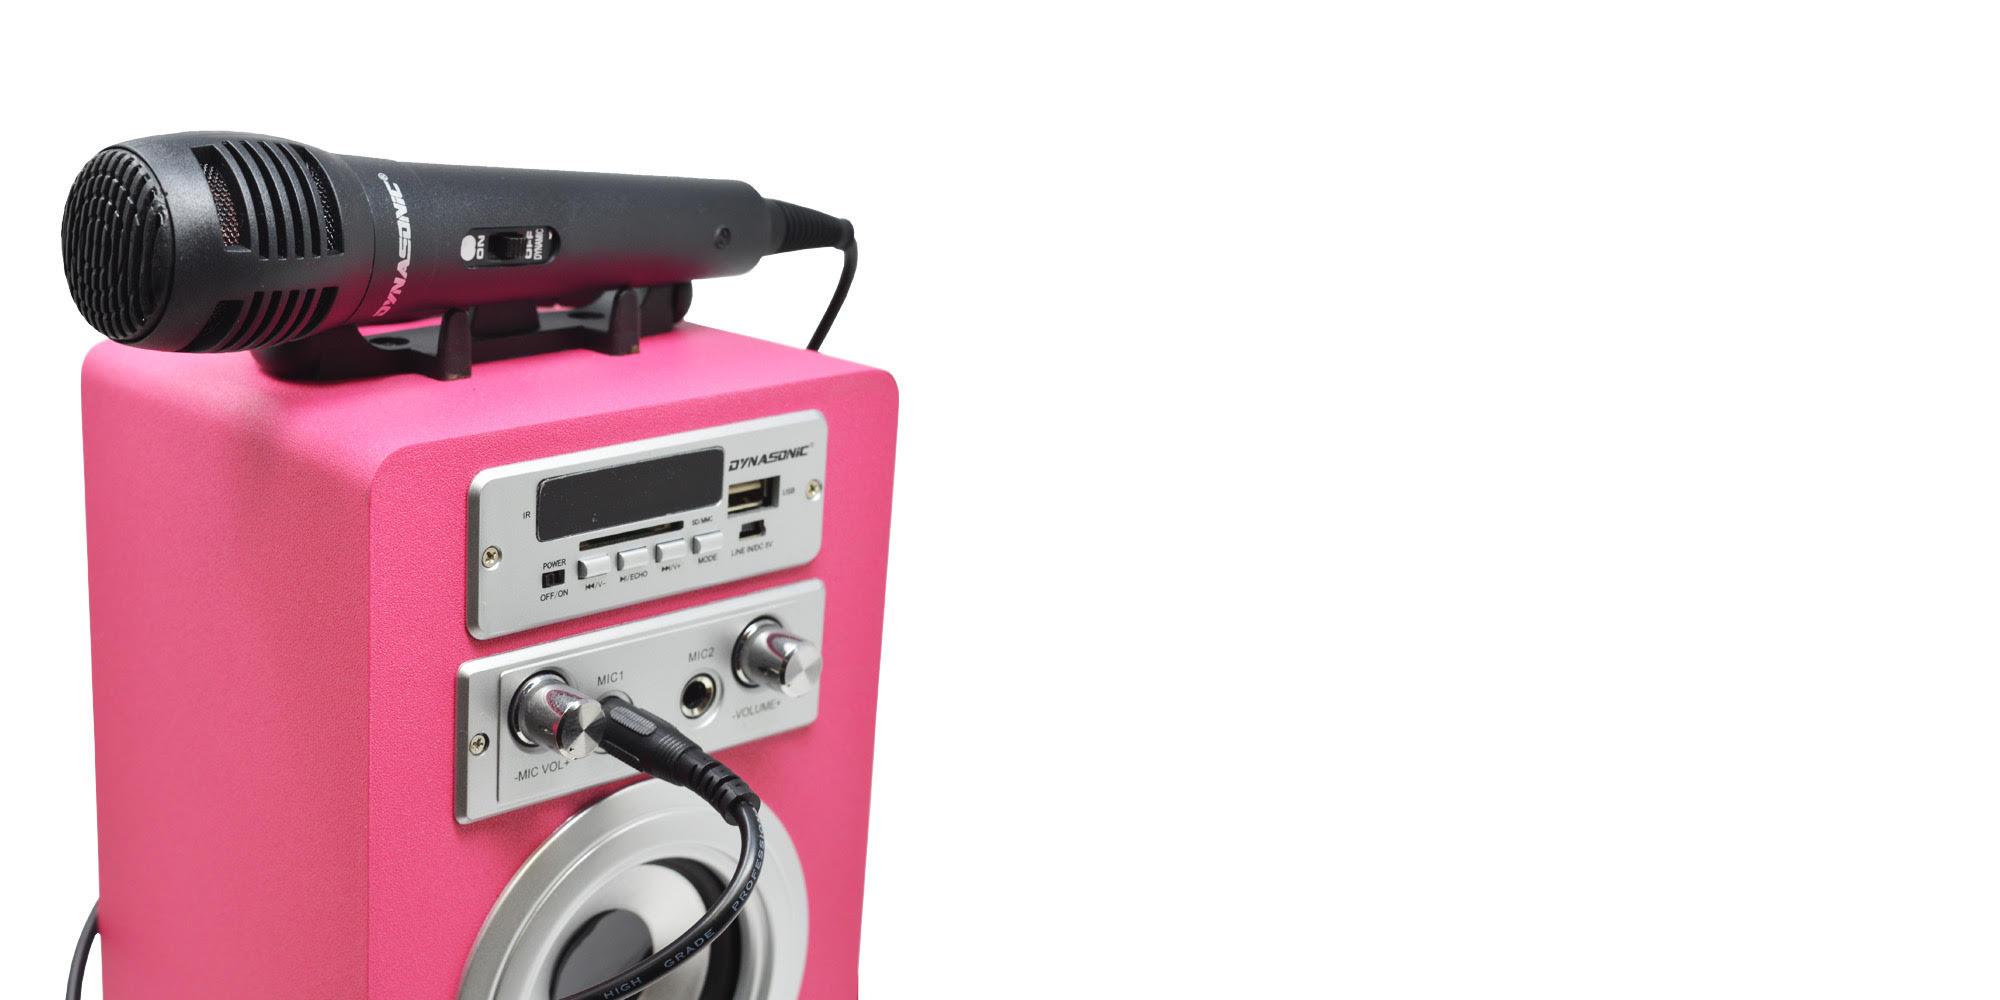 Altavoz Karaoke Serie 025 Dynasonic Electrónica